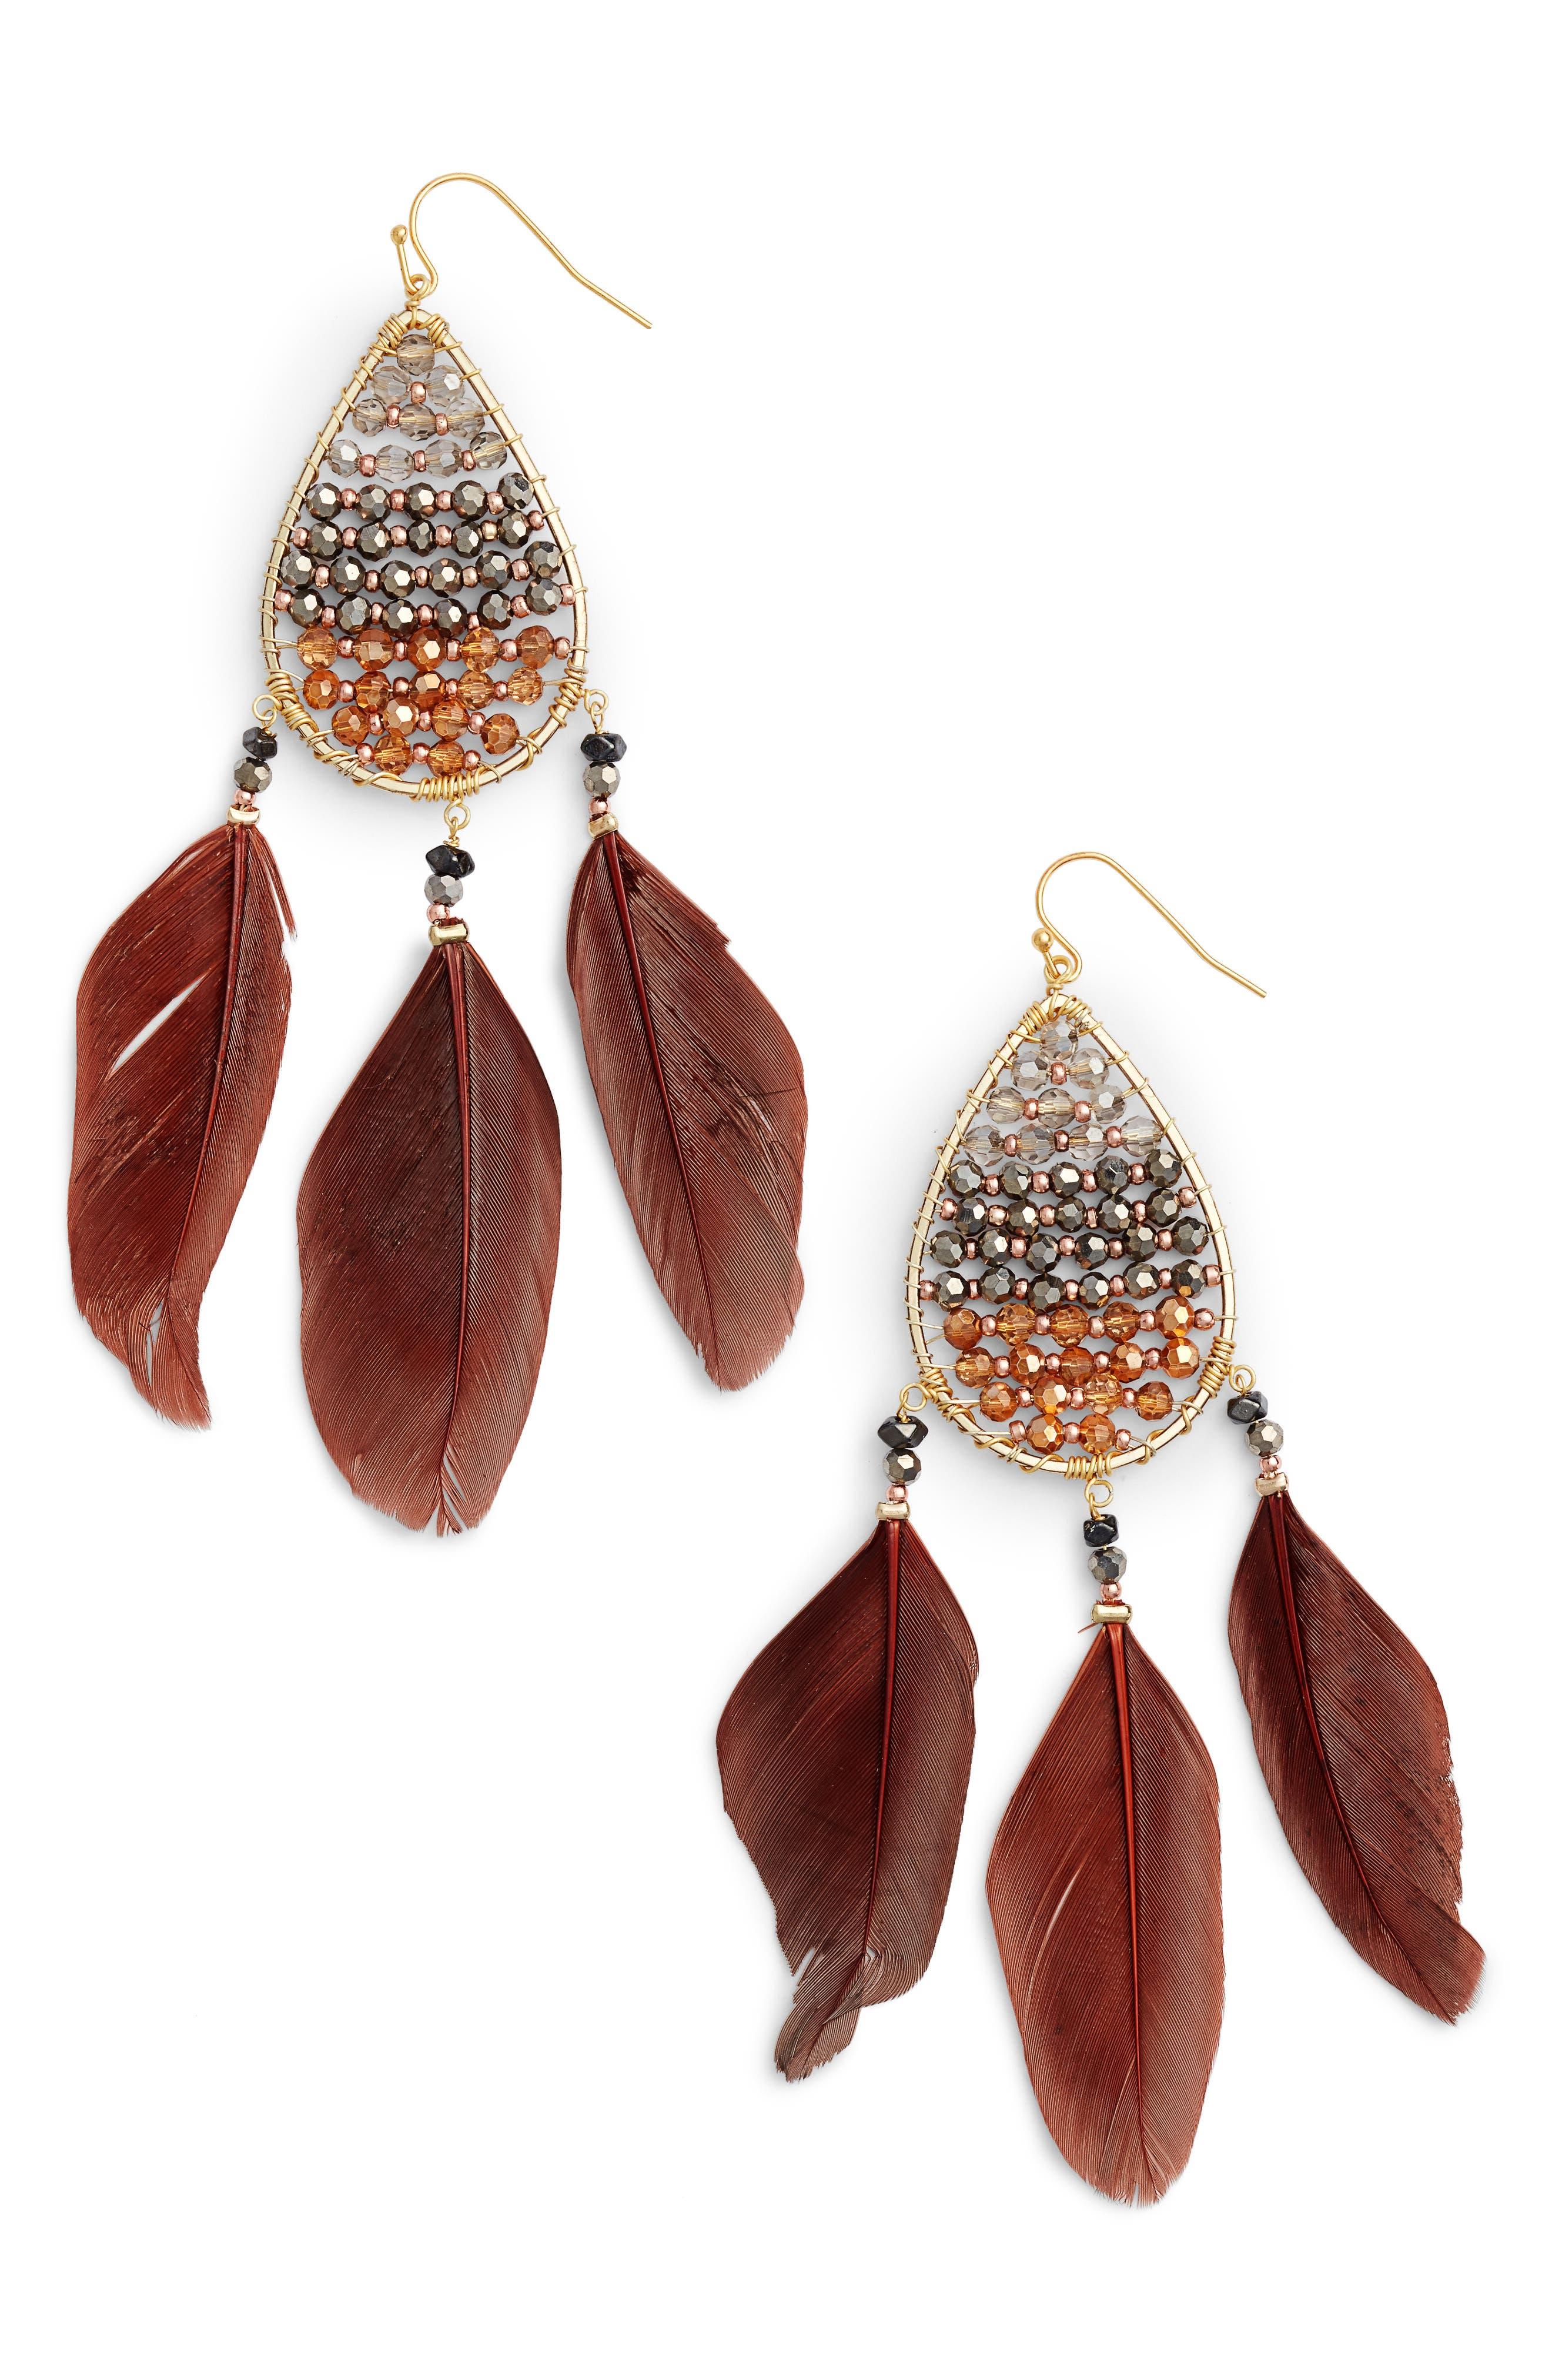 Alternate Image 1 Selected - Nakamol Design Teardrop Feather Earrings